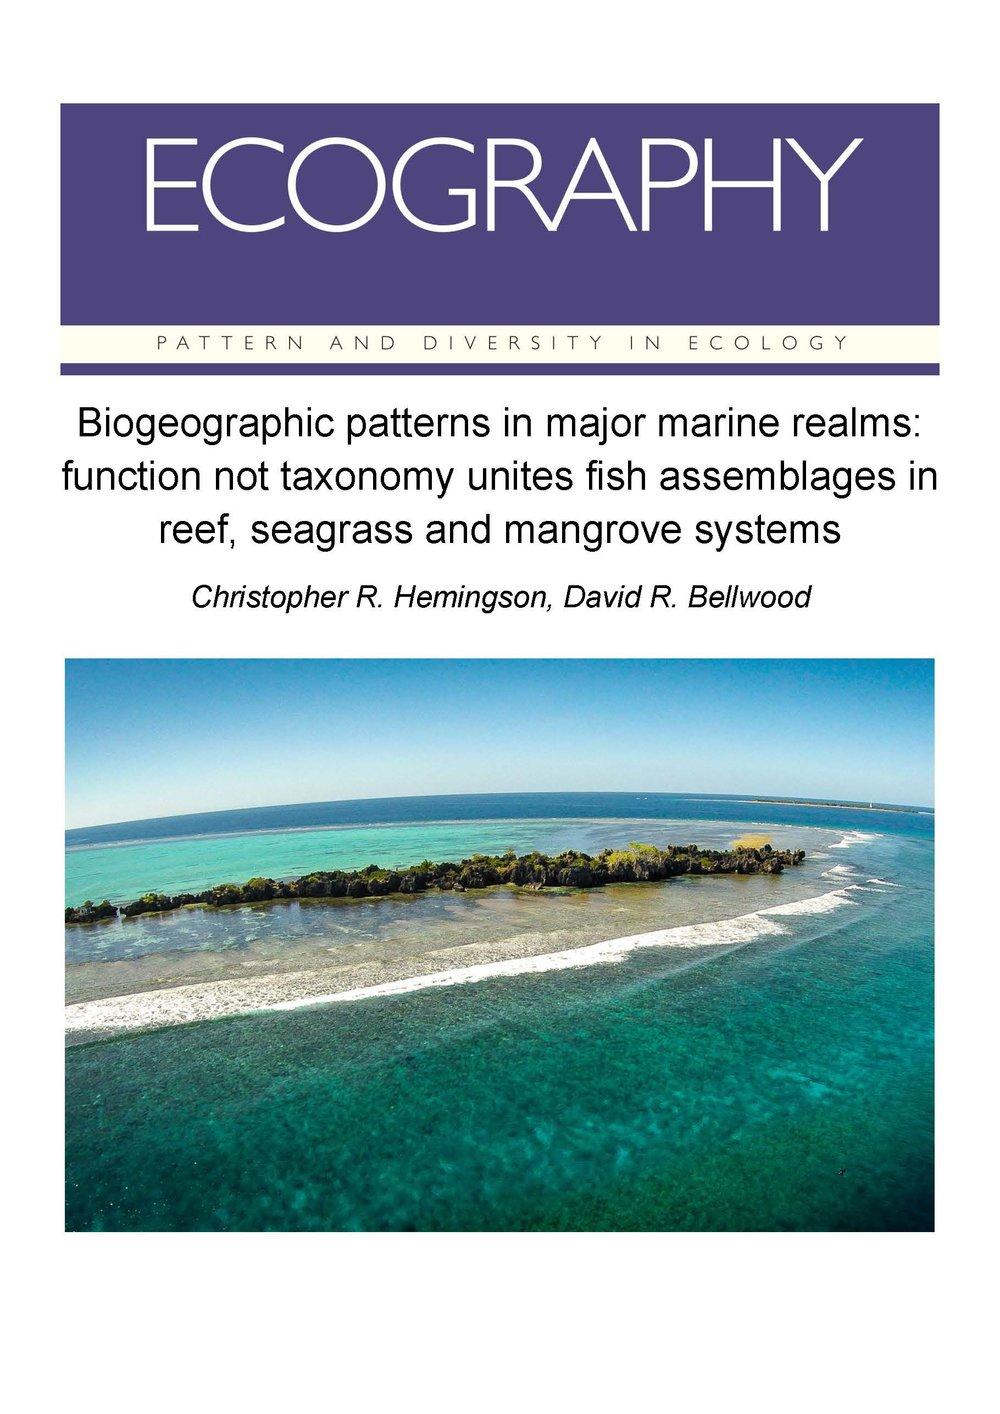 Hemingson et al. (Ecography).jpg